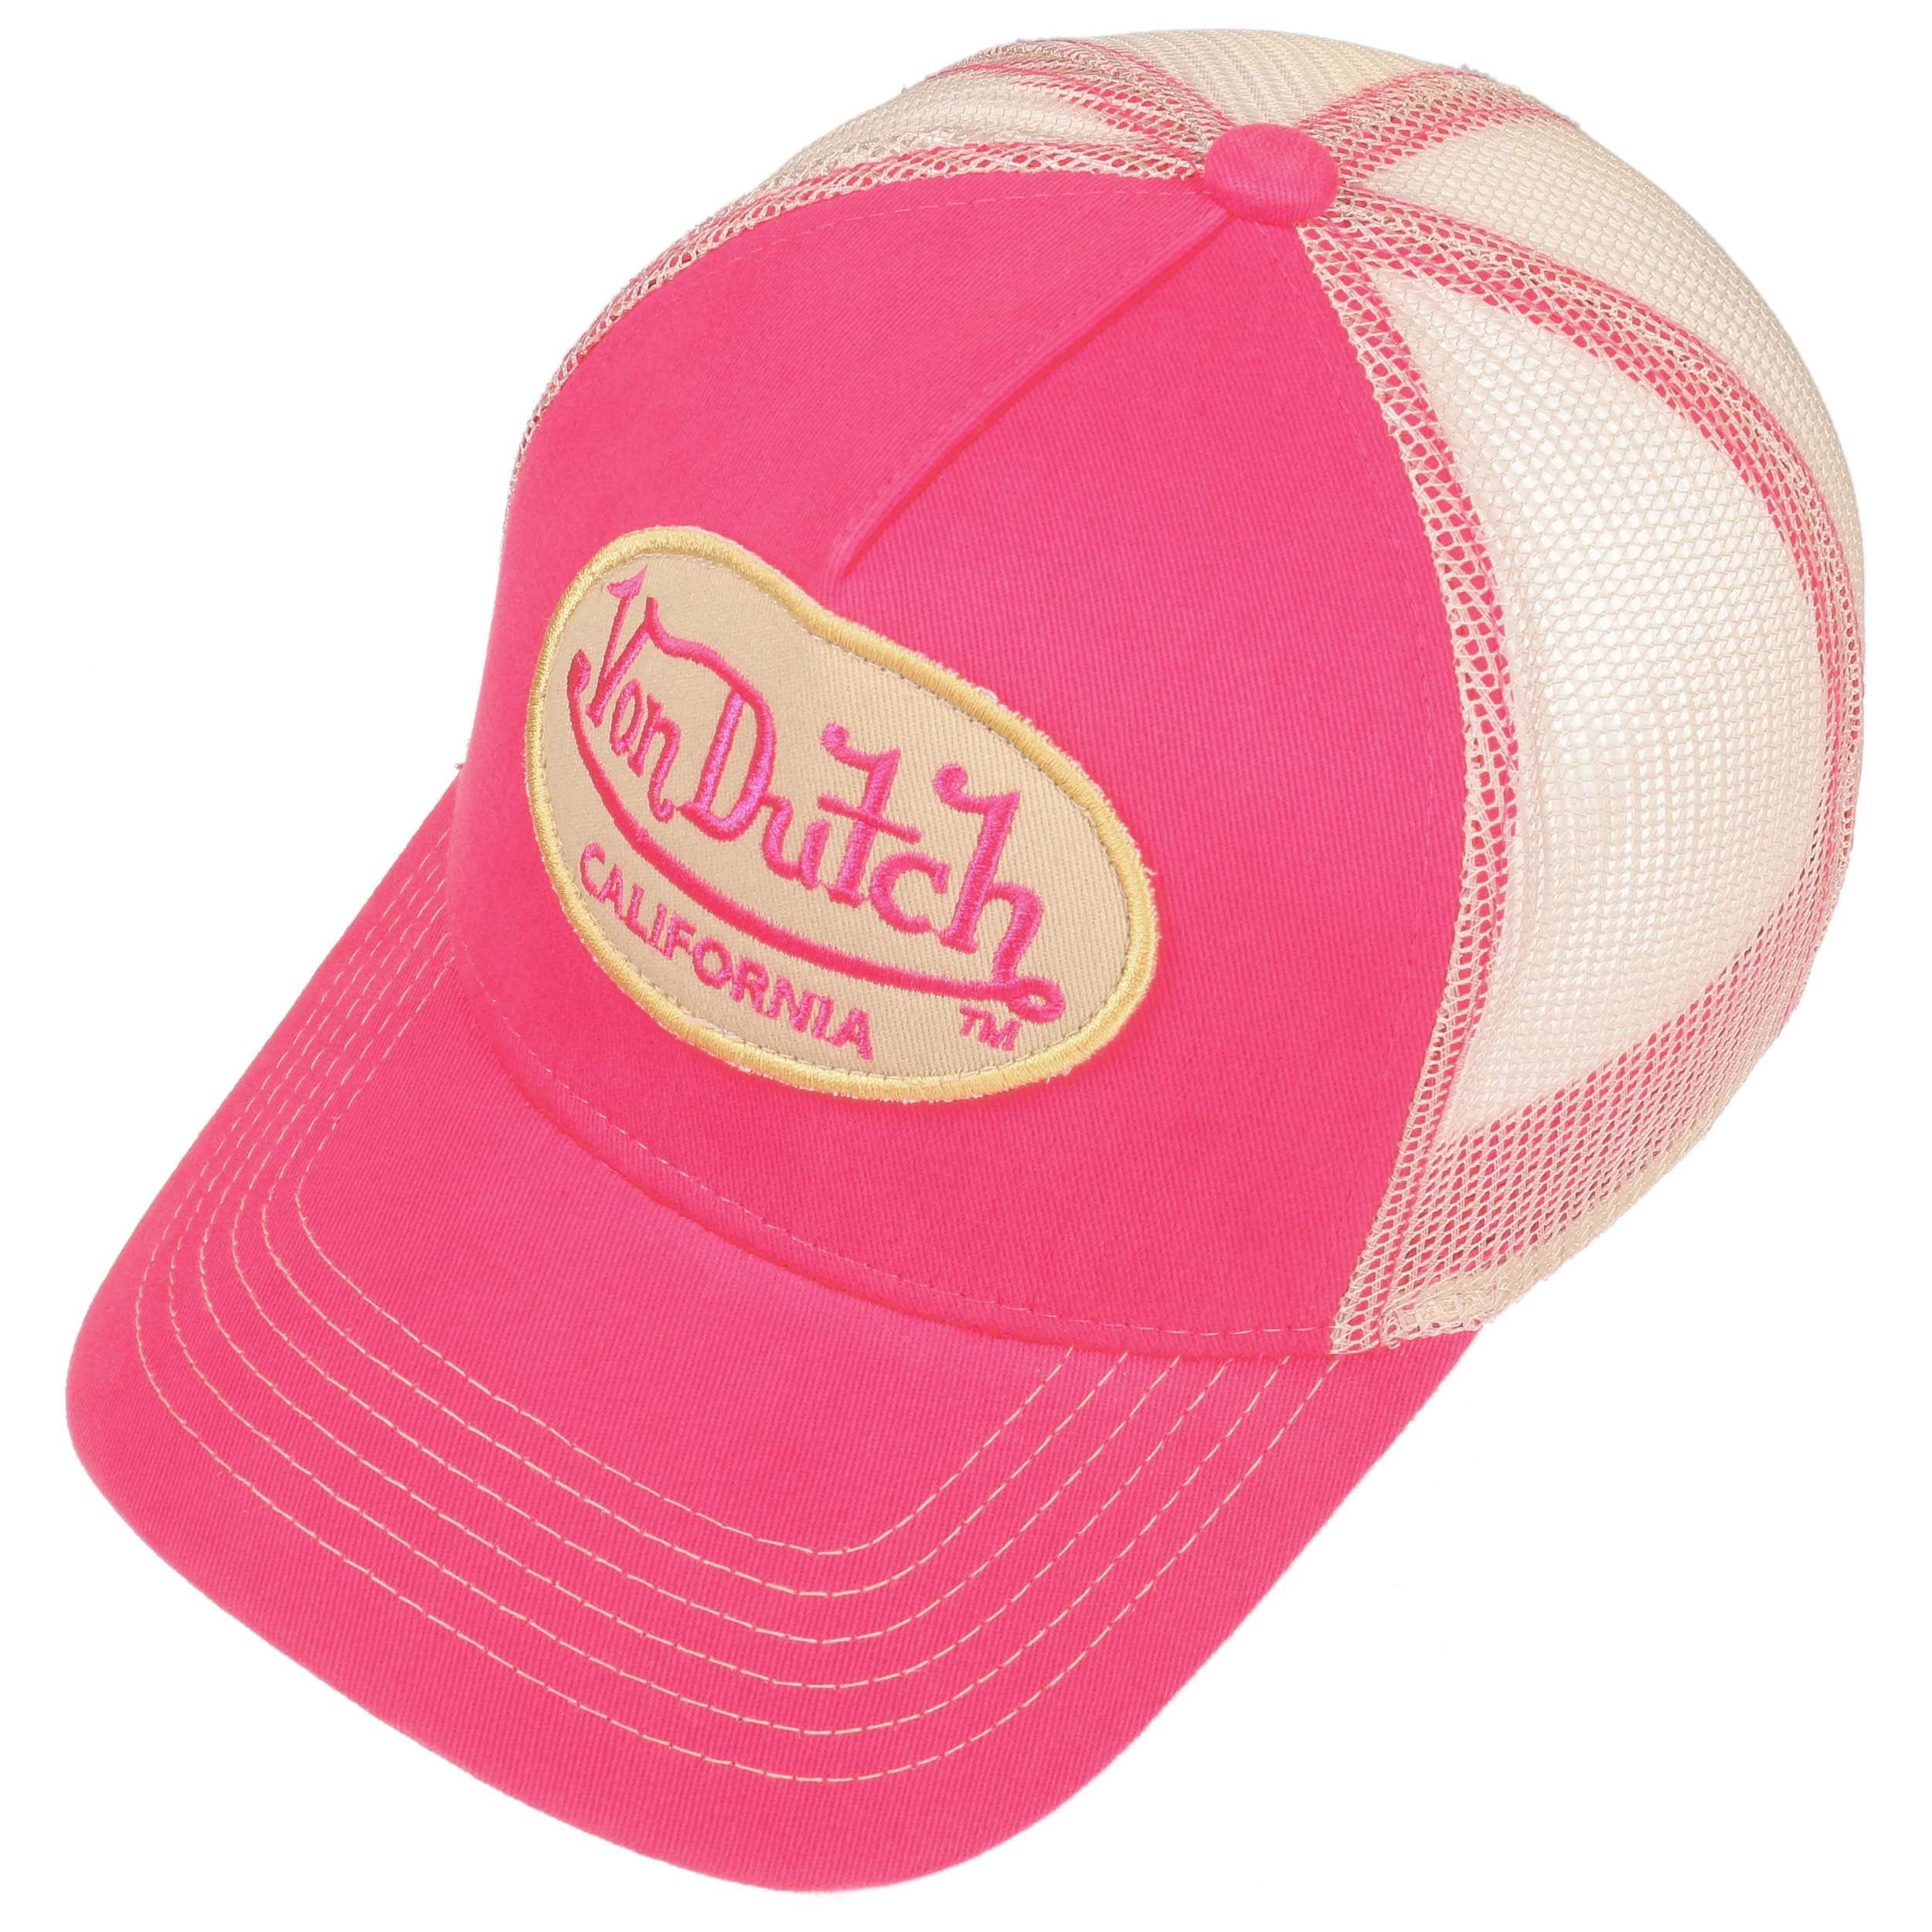 ec12dfc57e2ca ... OG Trucker Cap by Von Dutch - pink 1 ...